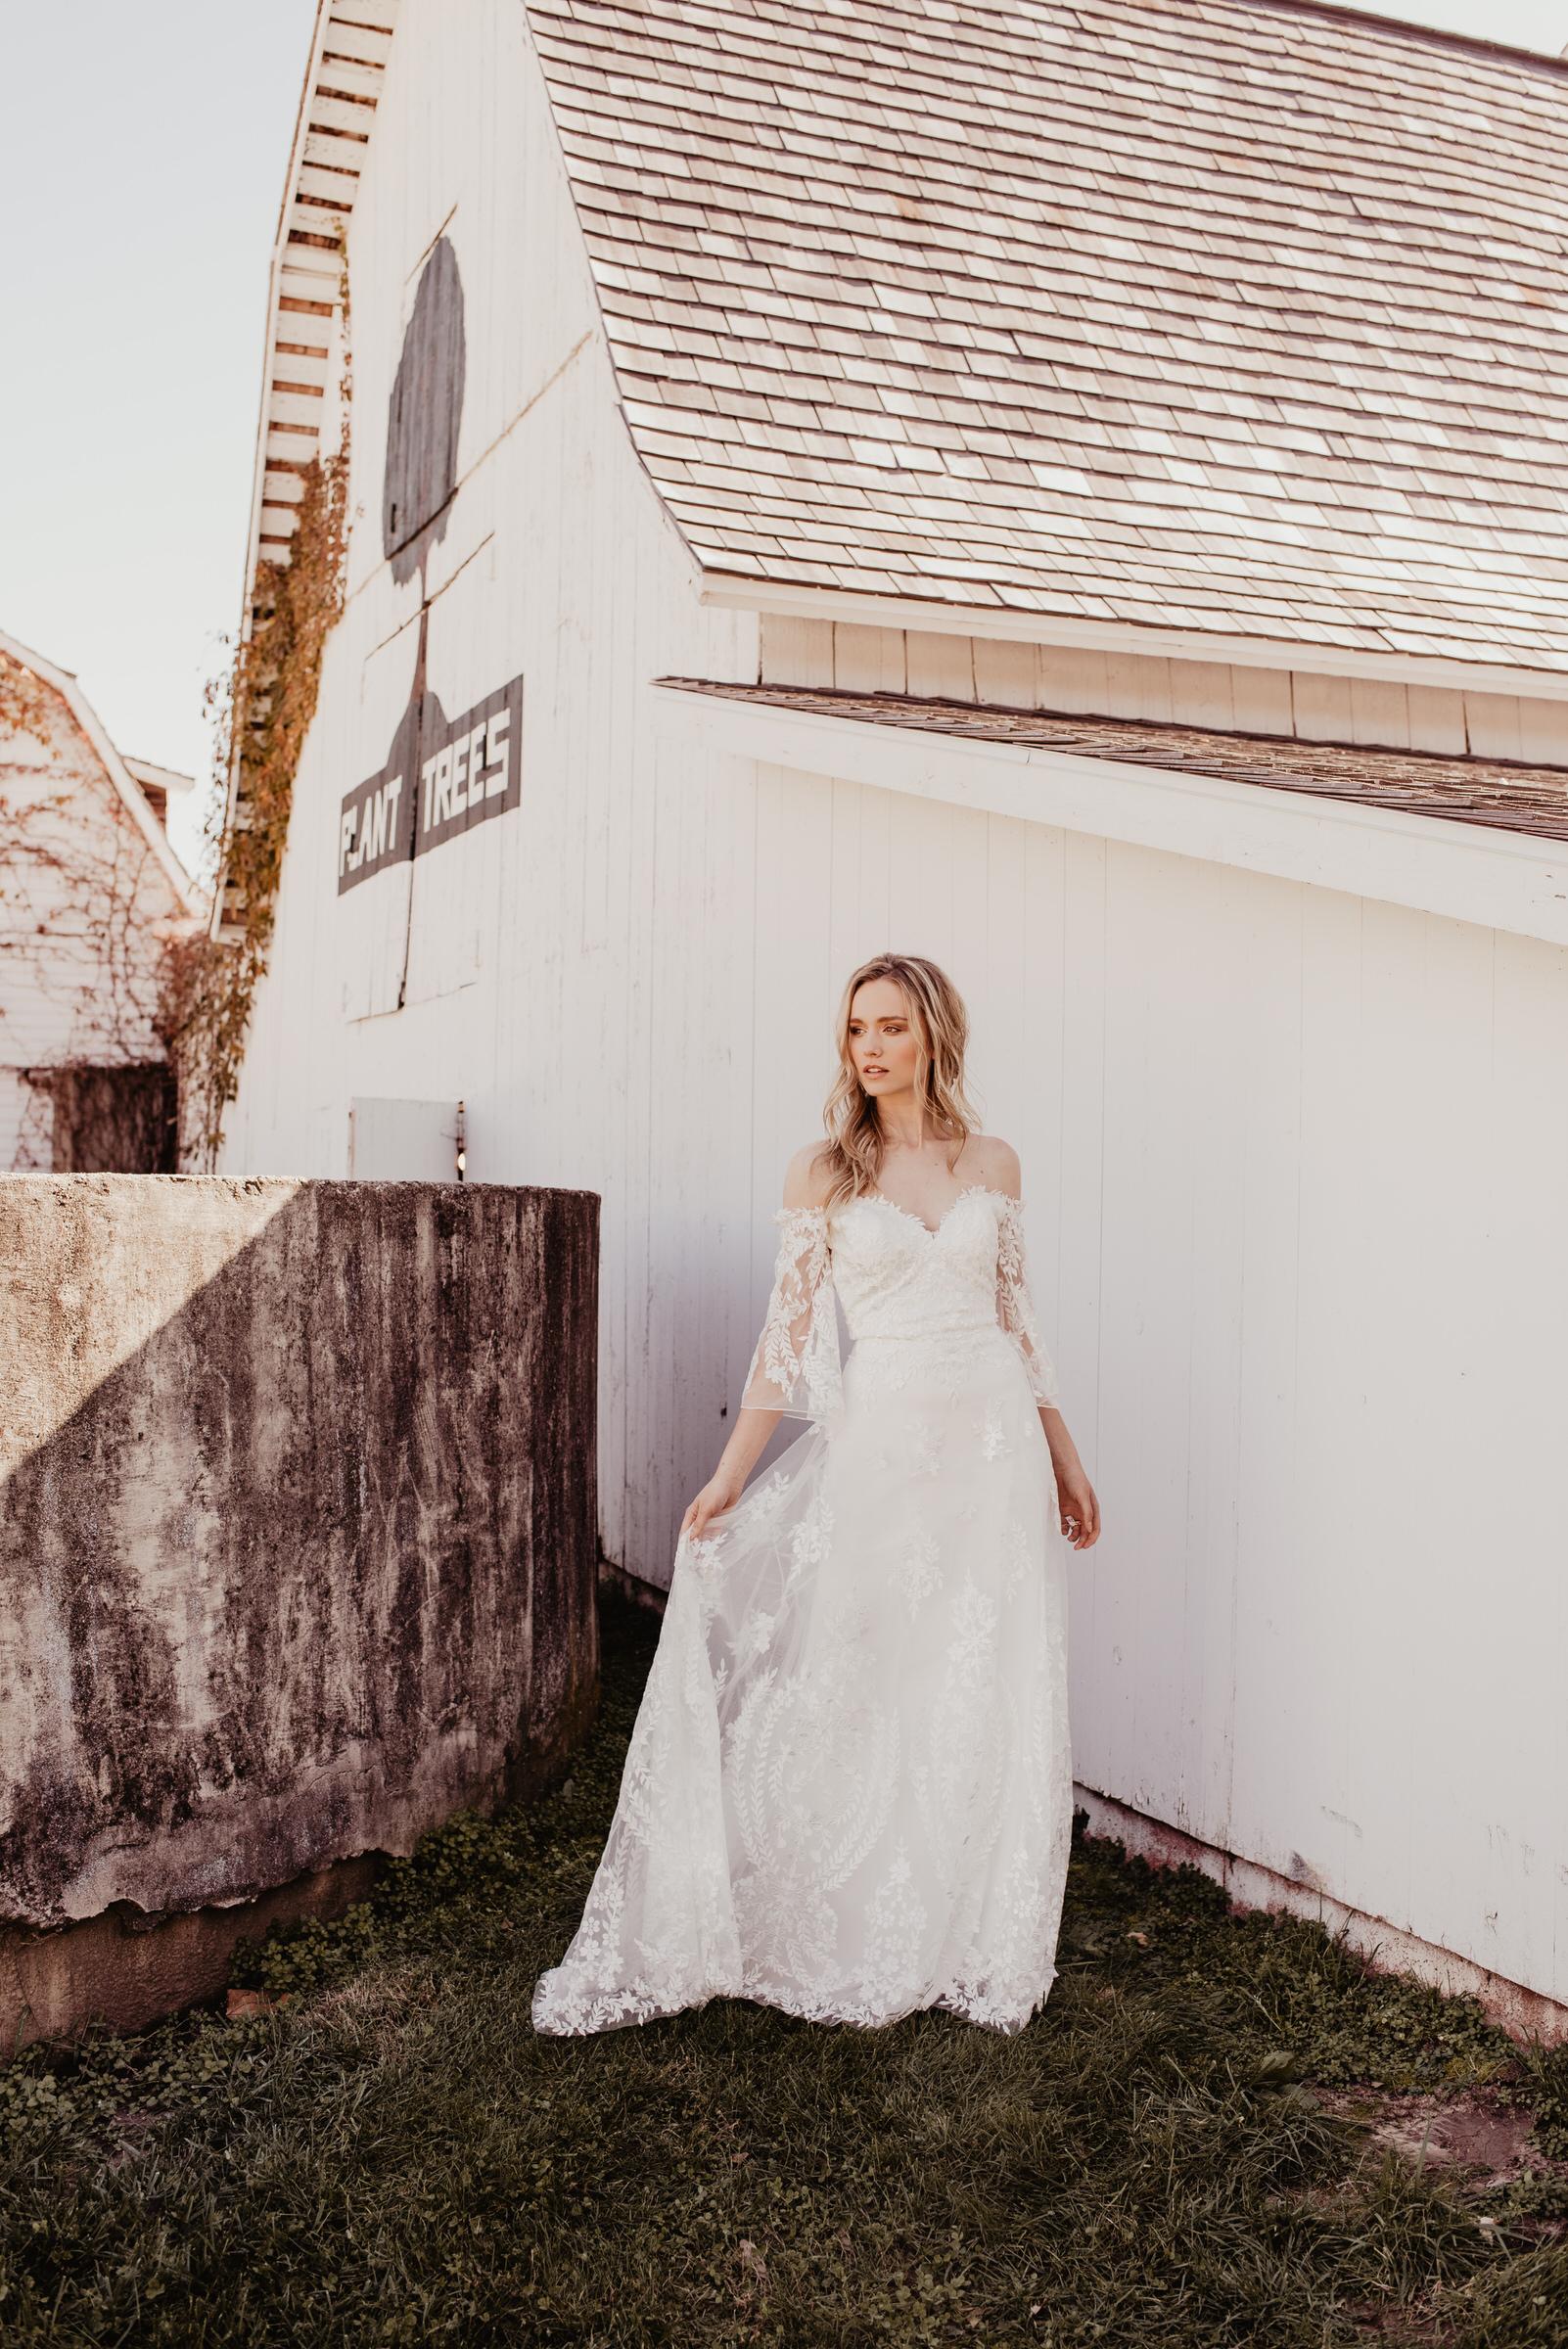 Kaylie-Sirek-Photography-NWD-SS19-29.jpg